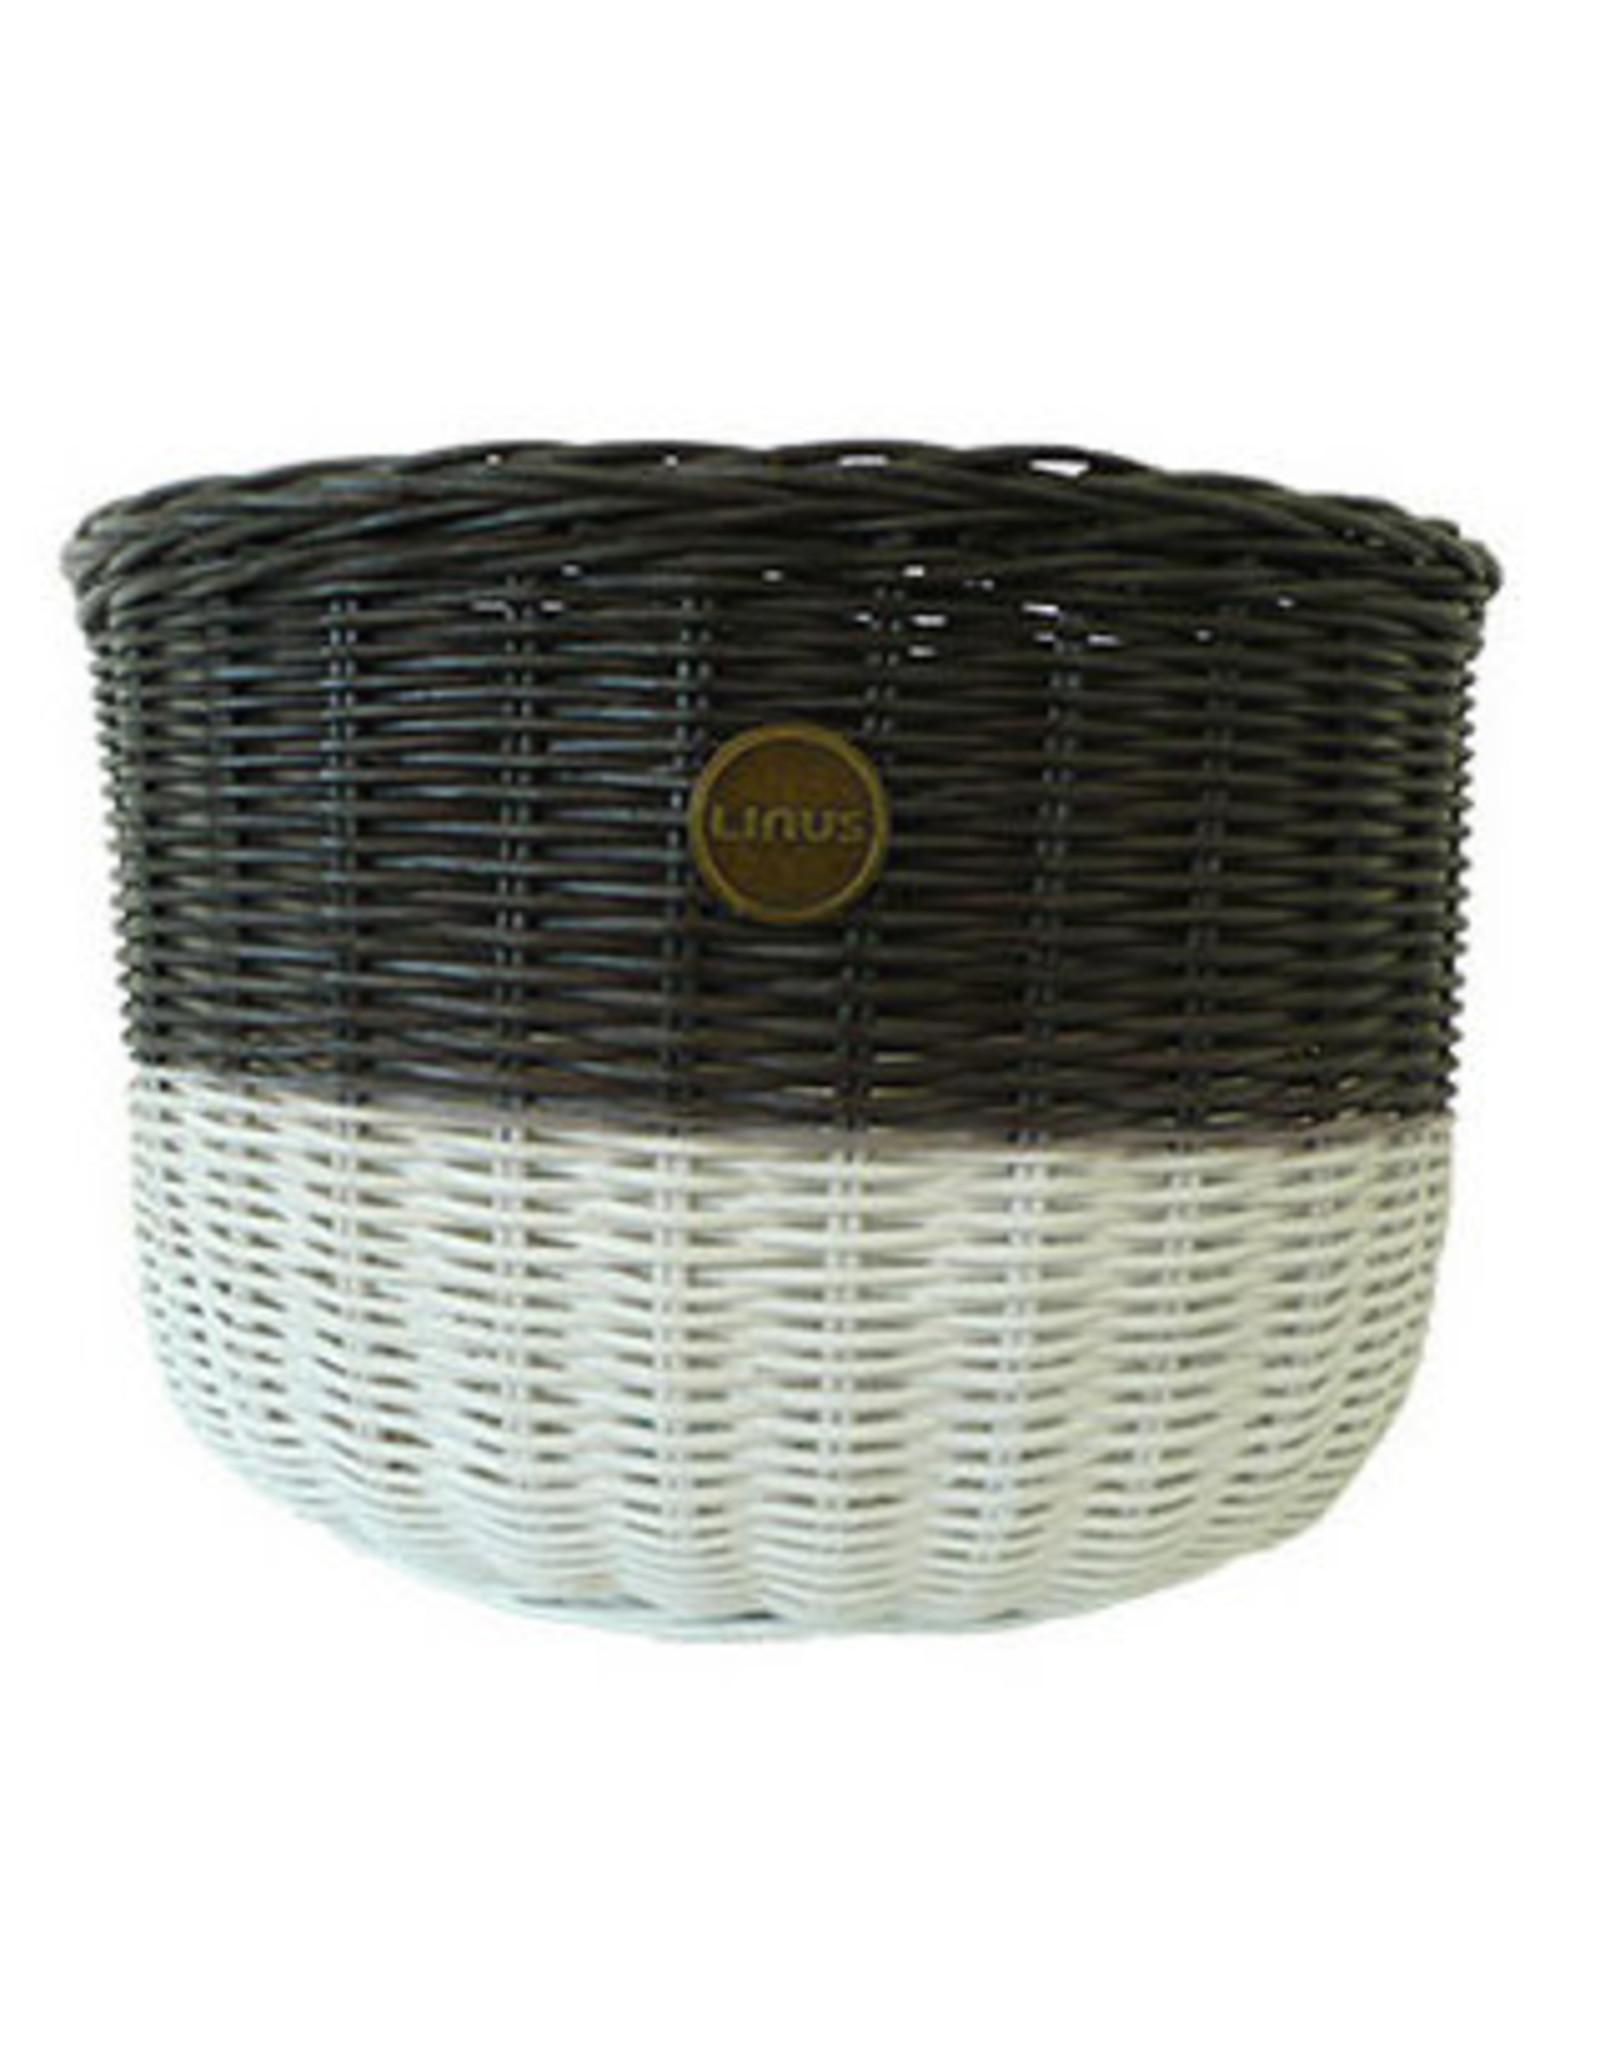 Linus LINUS, Oval Basket Rattan, Brown/White